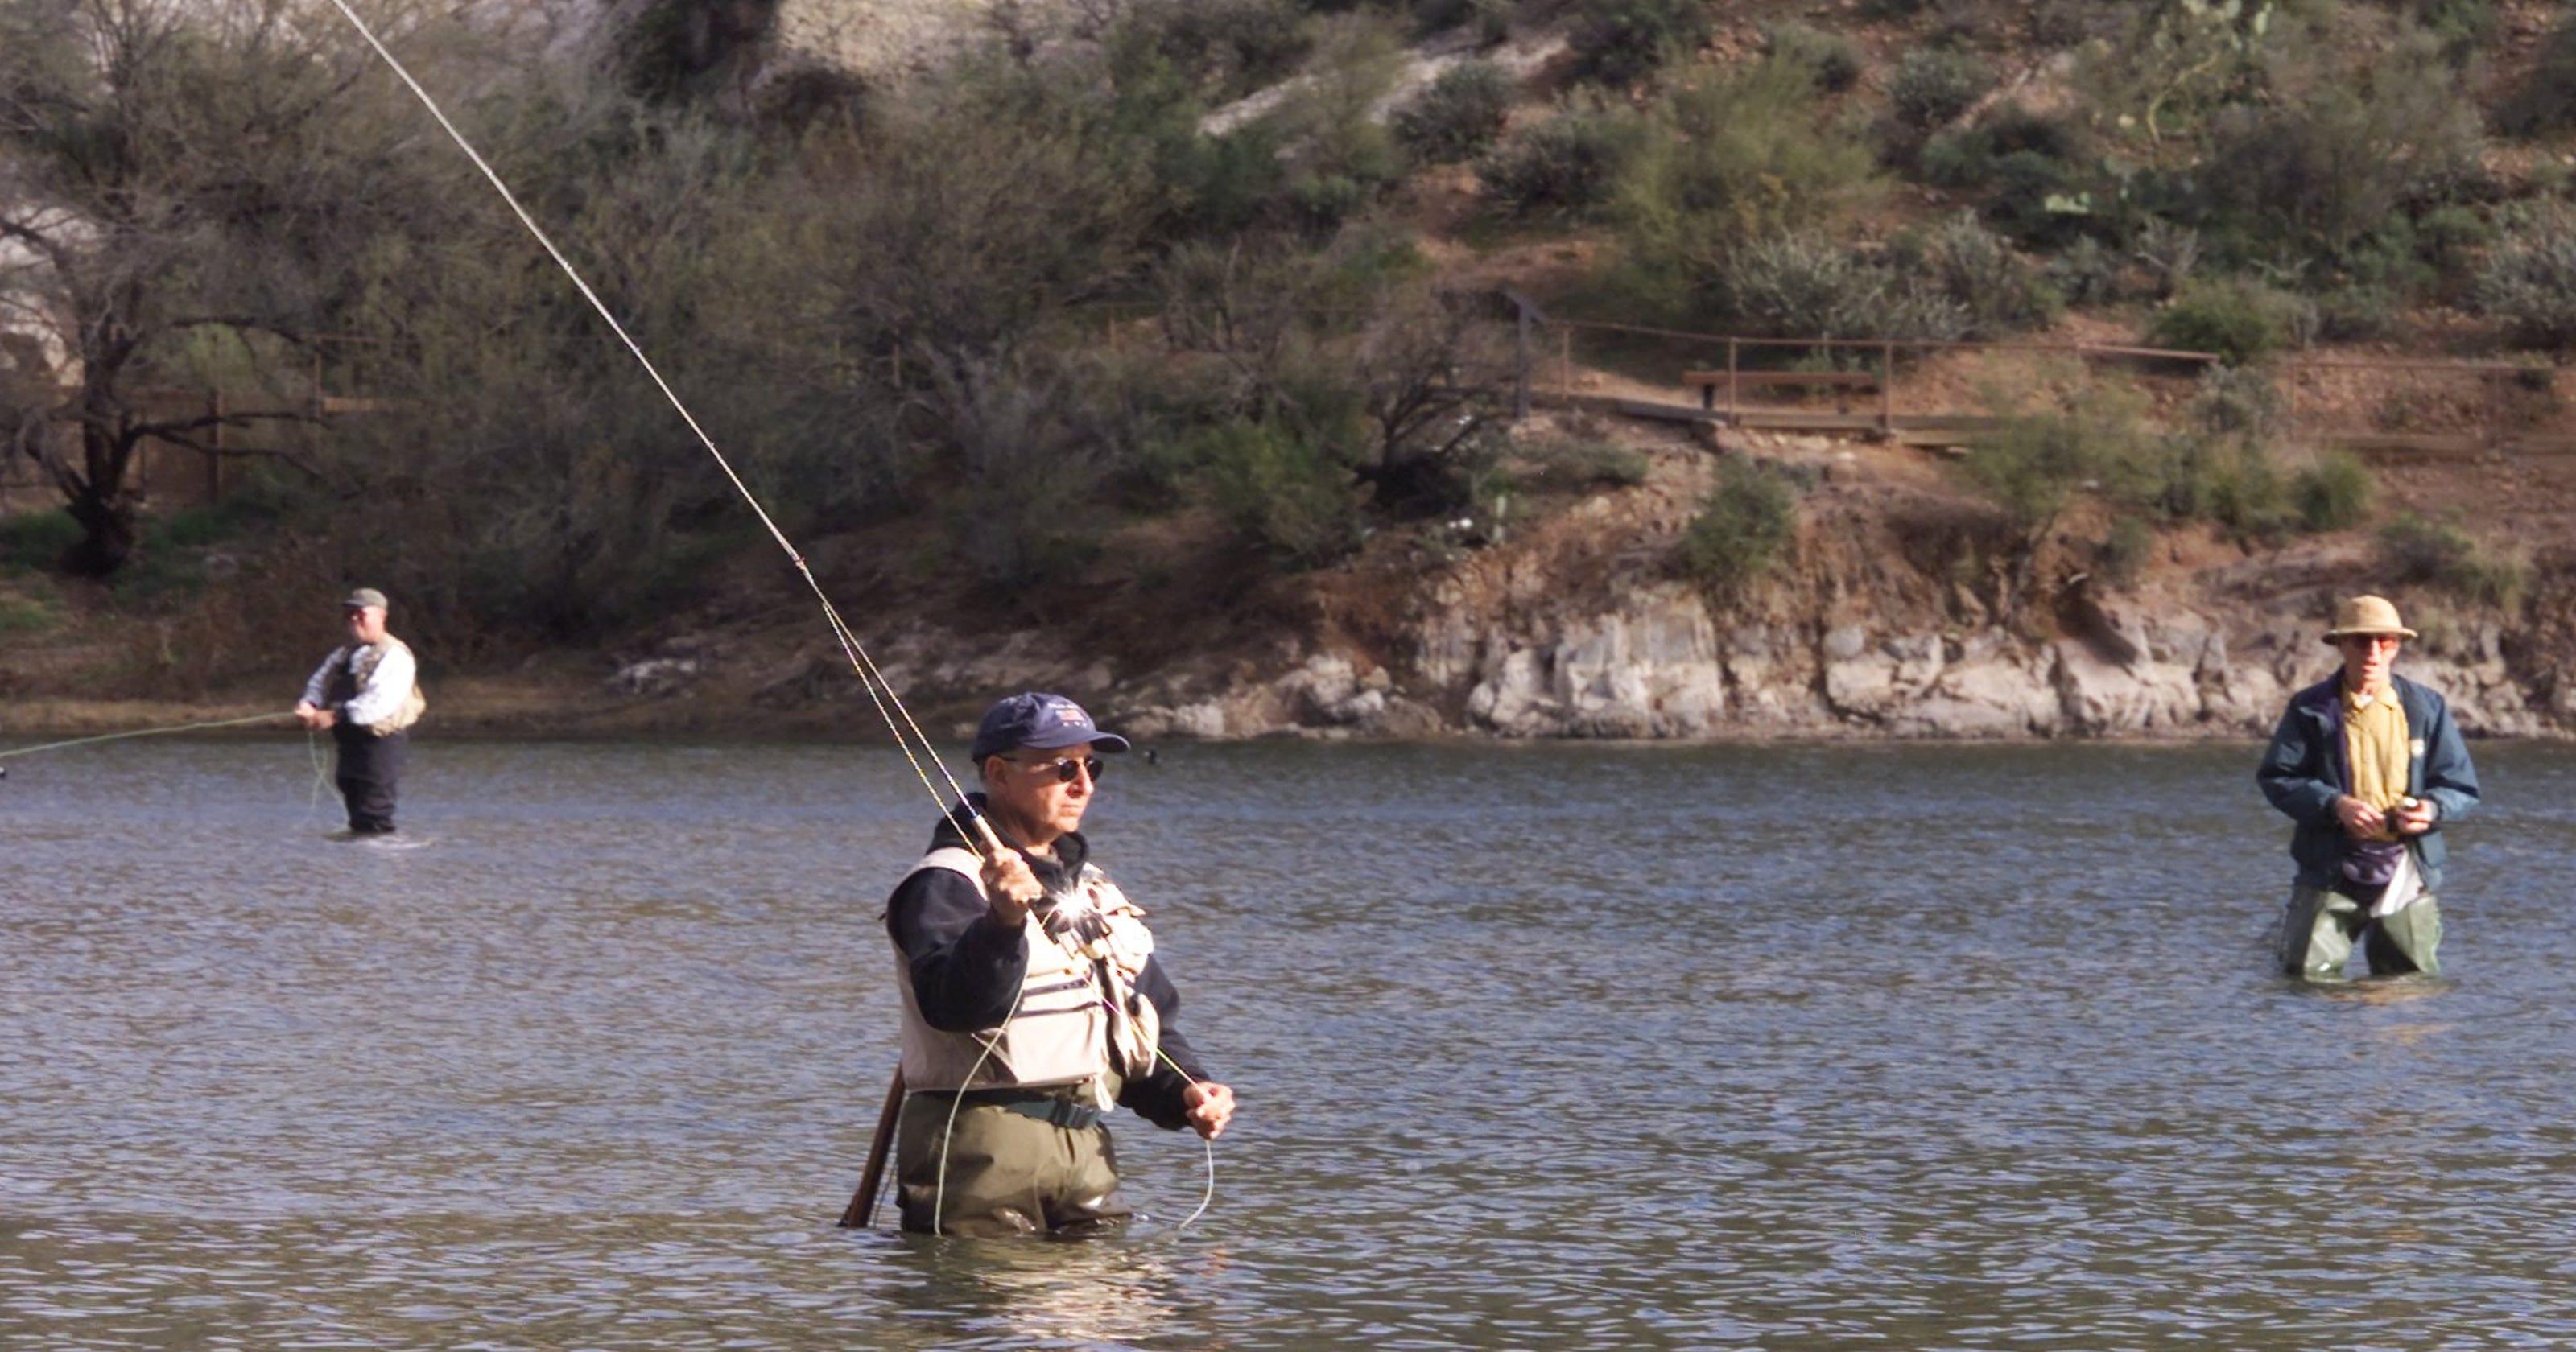 6/7: Free Fishing Day across Arizona